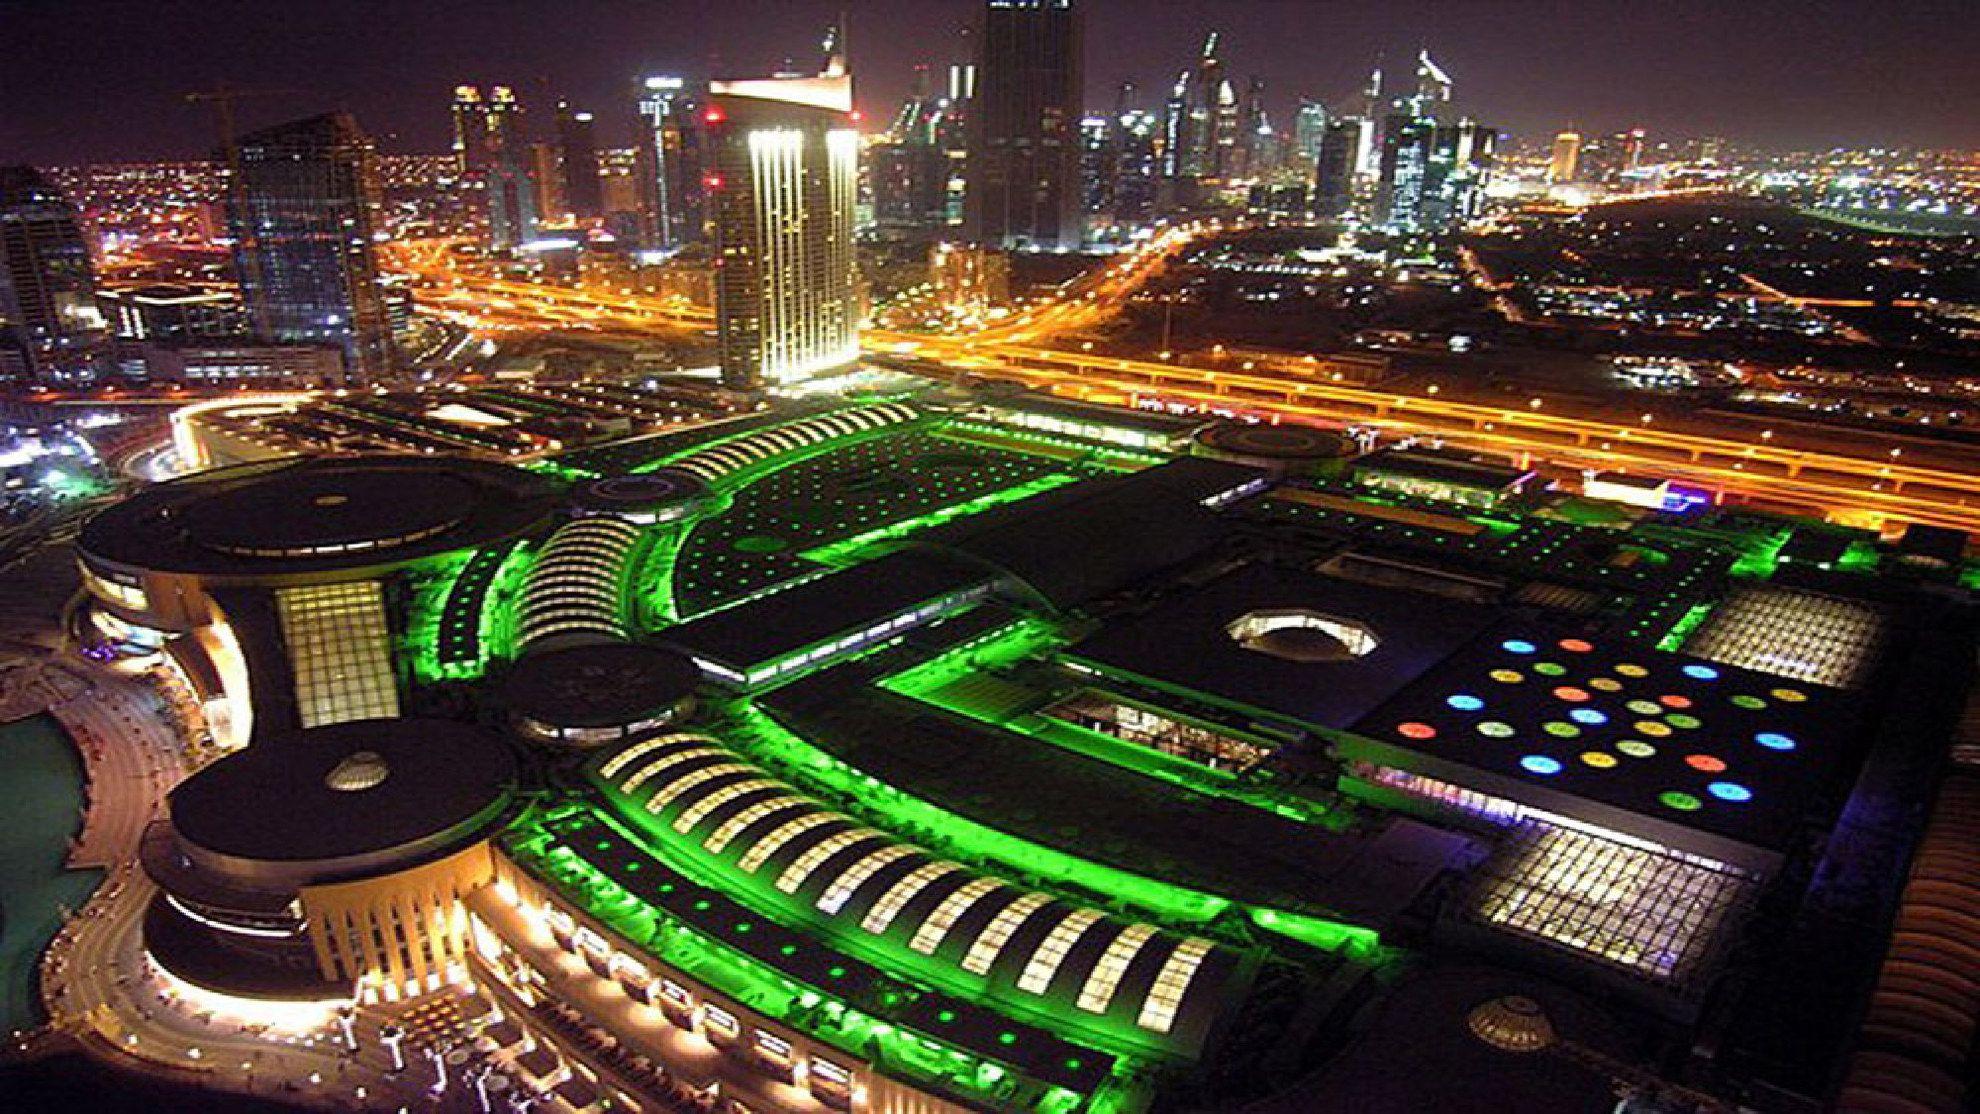 Atlantis Hotel On Palm Jumeirah Island Dubai High-Res ...  |Palm Island Dubai From Burj Hotel